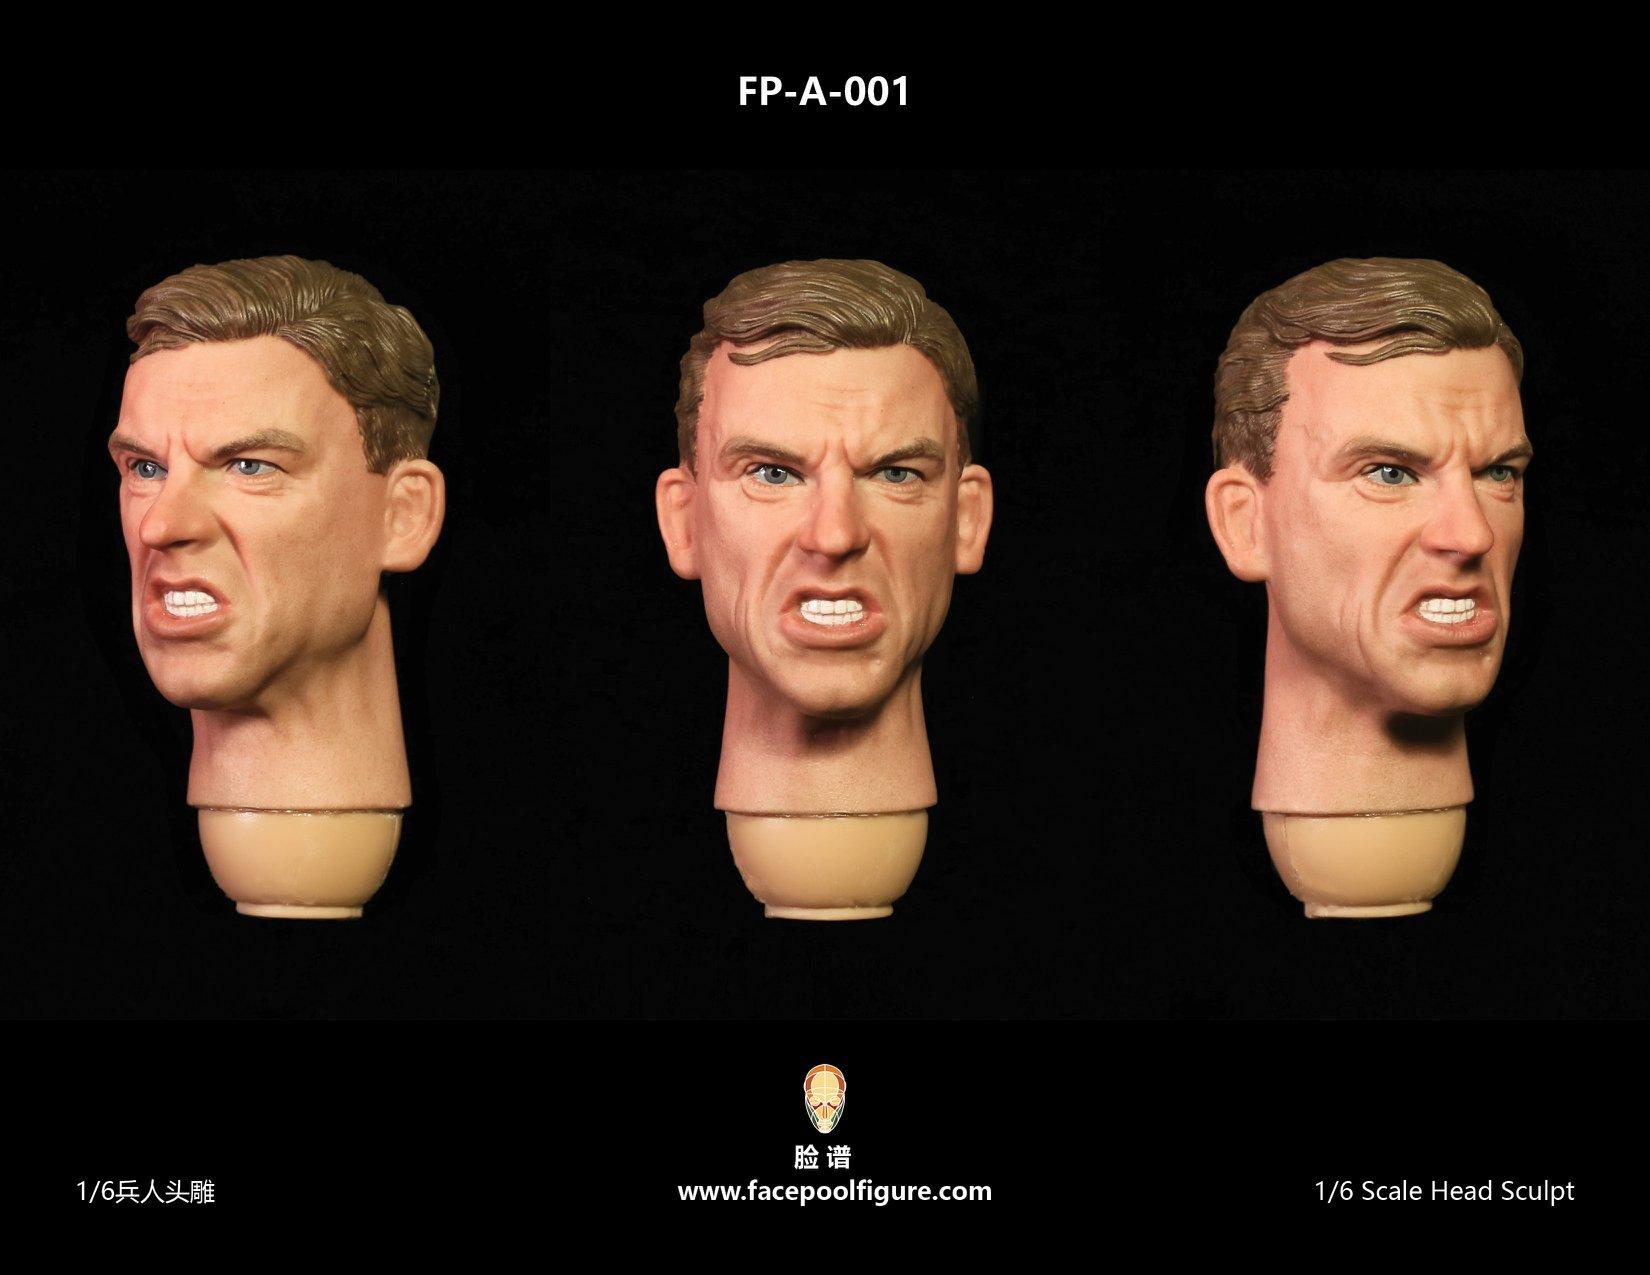 fpf-heads01